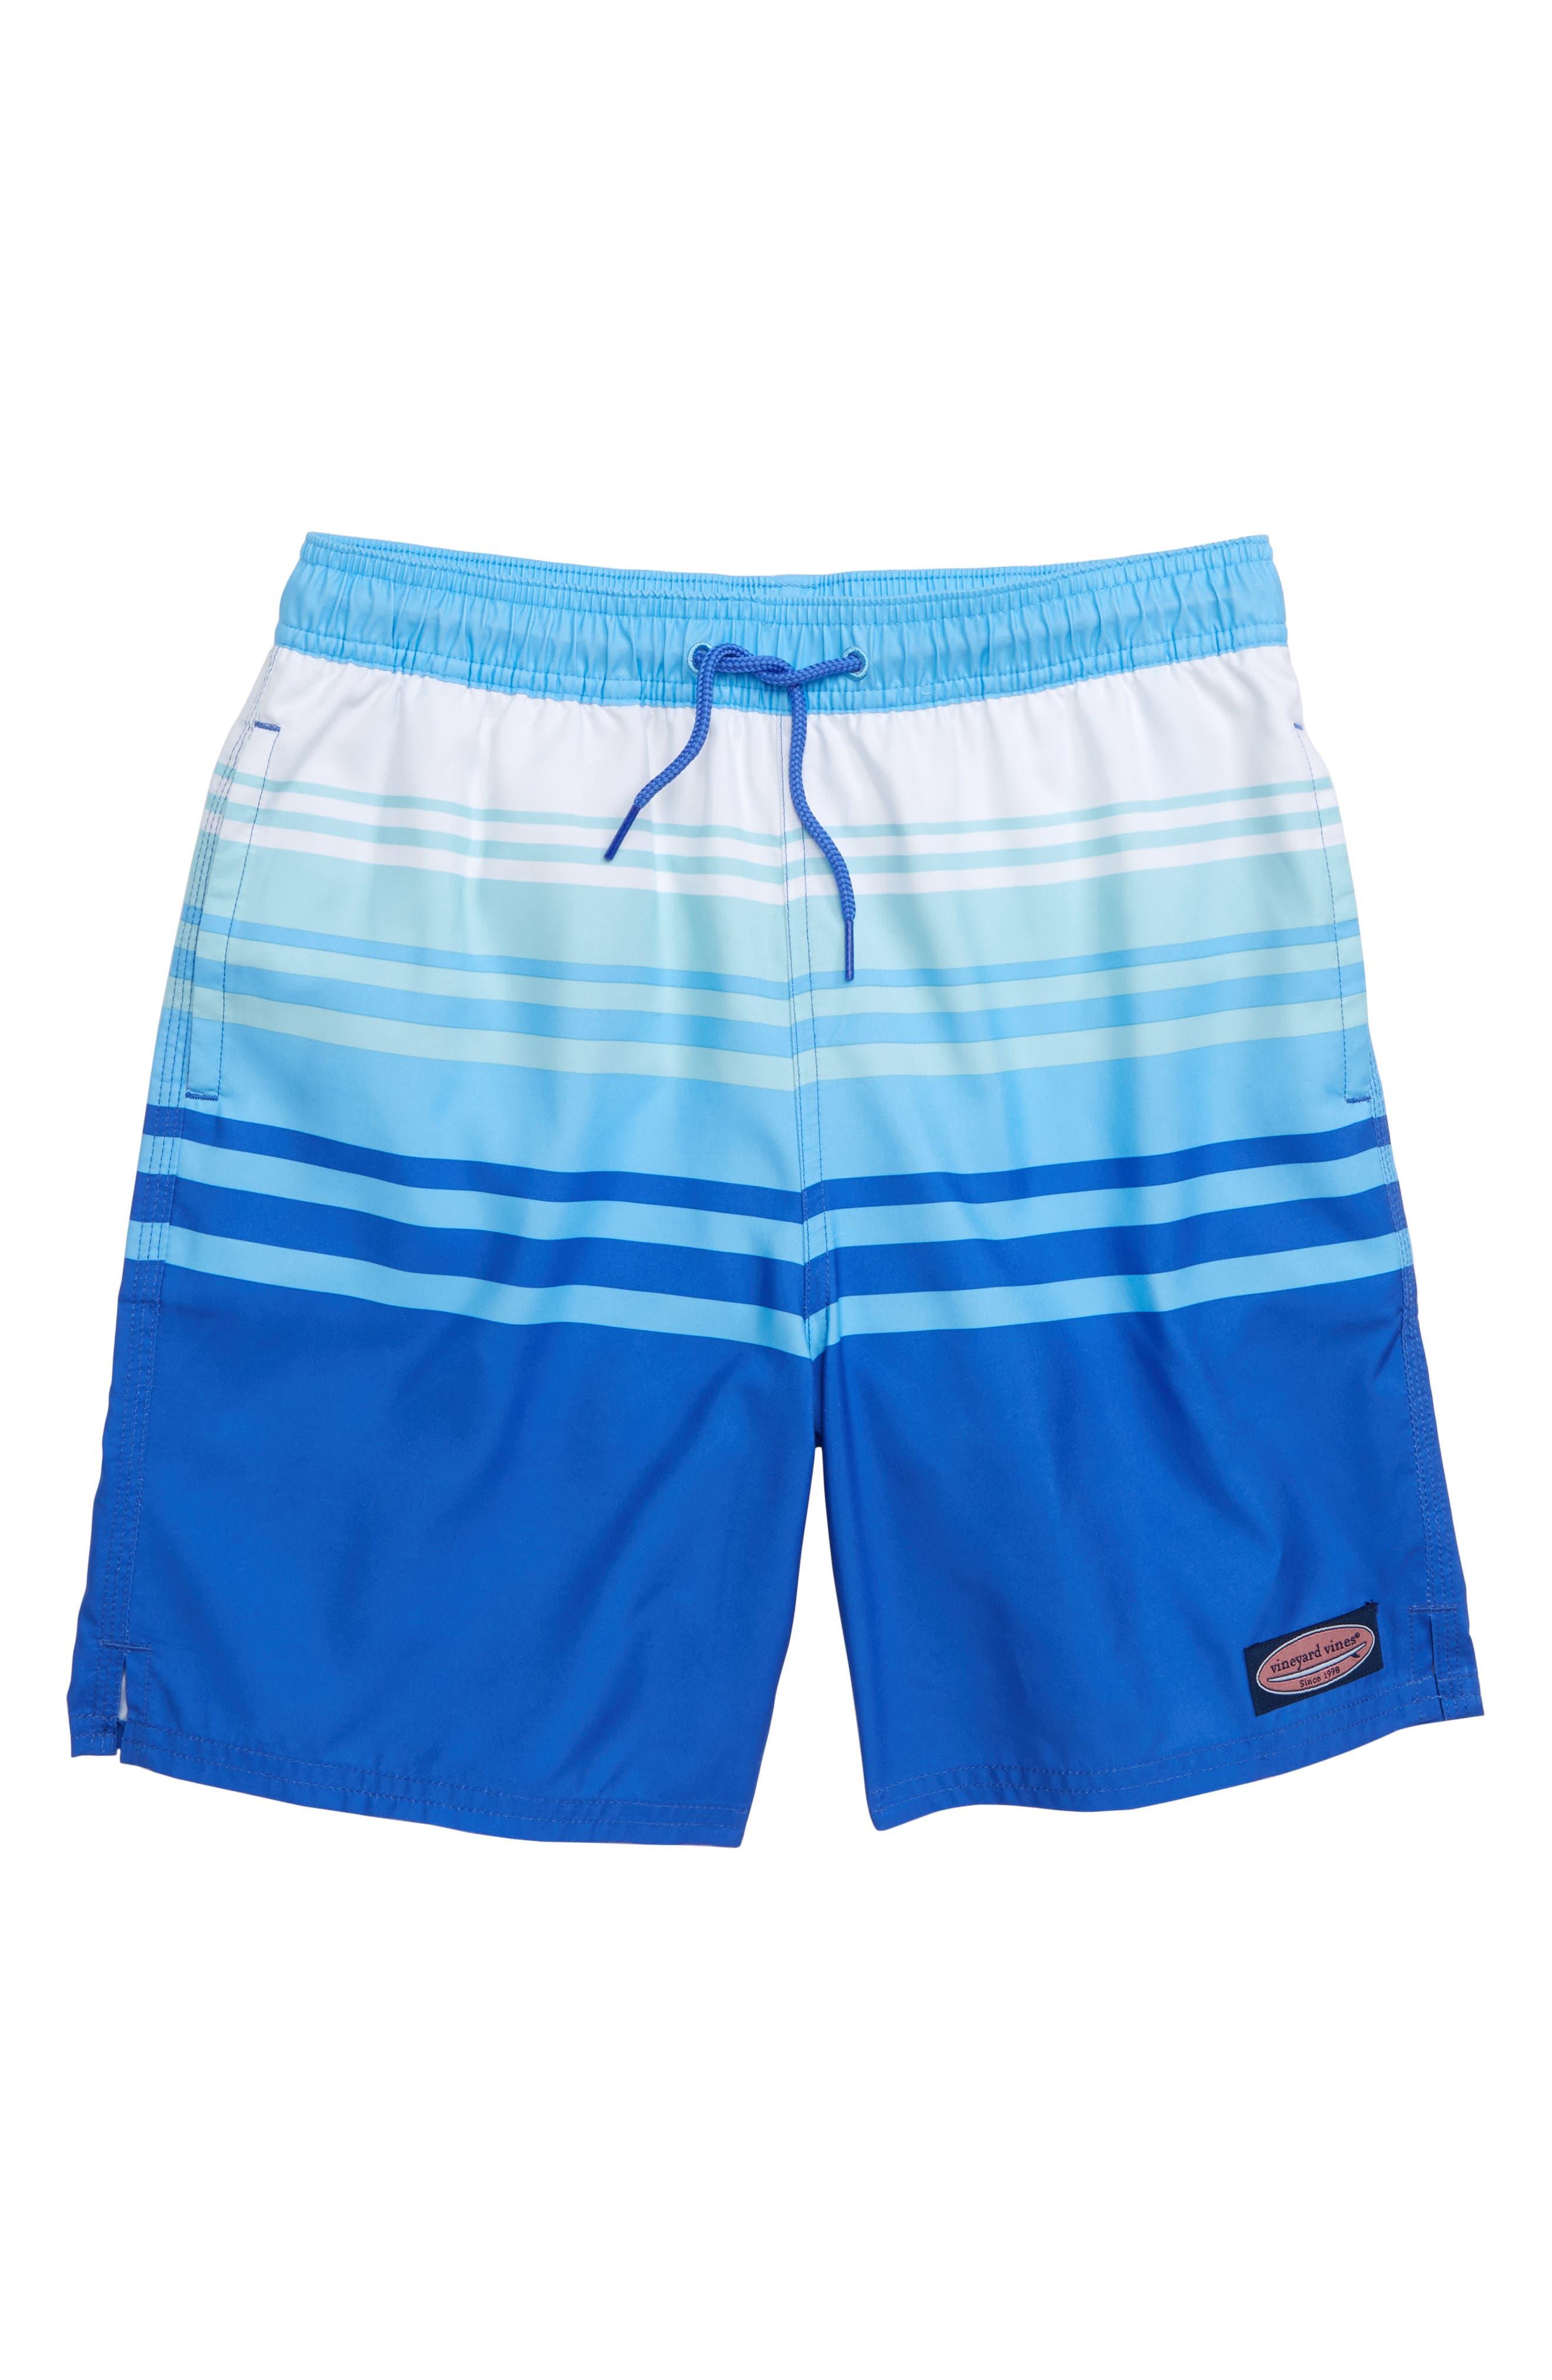 Dusk Stripe Chappy Swim Trunks,                         Main,                         color, 500